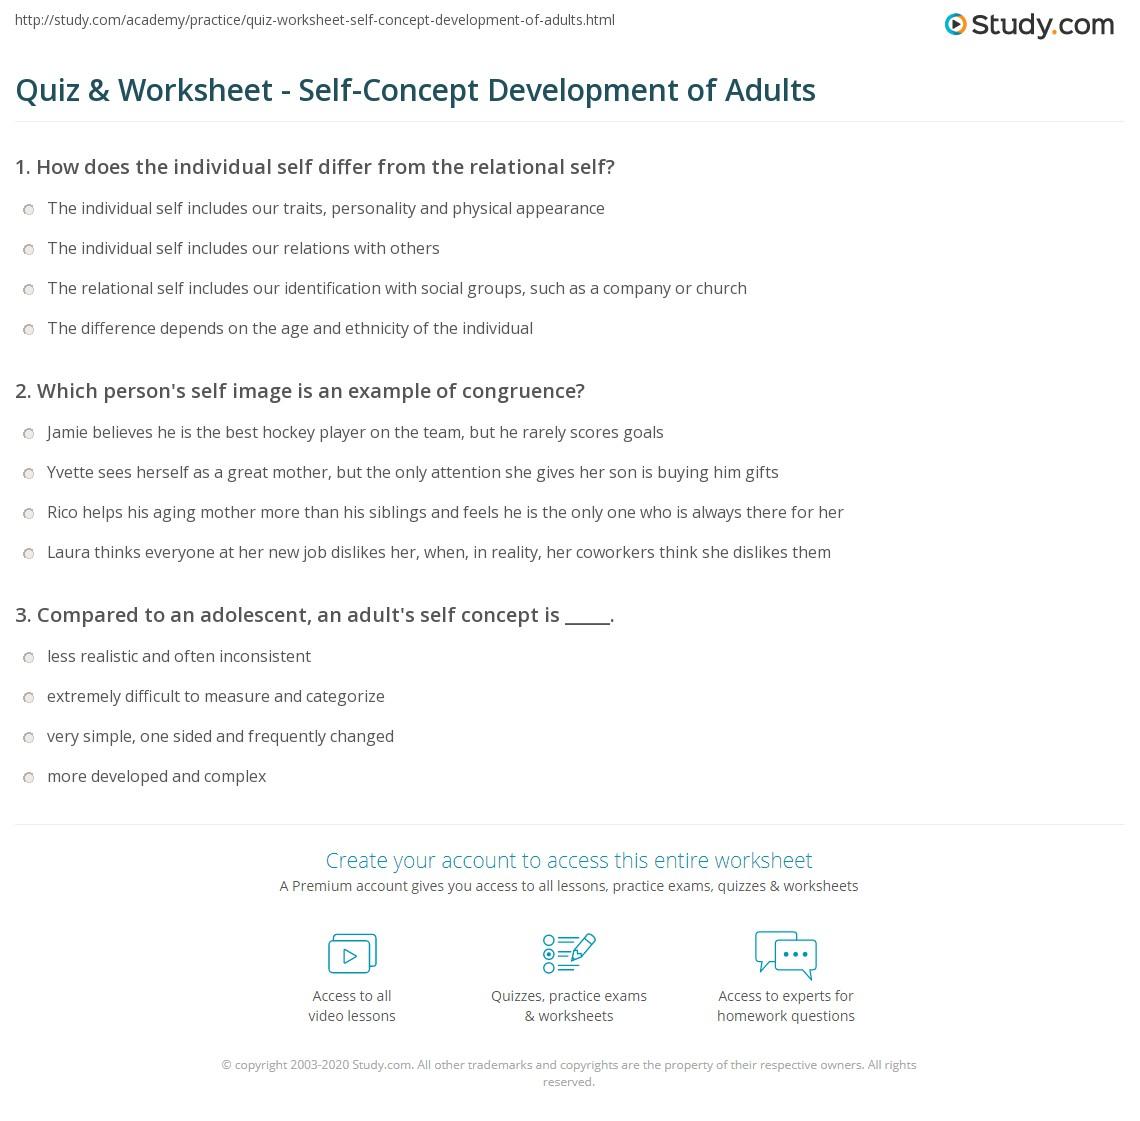 Quiz & Worksheet - Self-Concept Development of Adults | Study.com